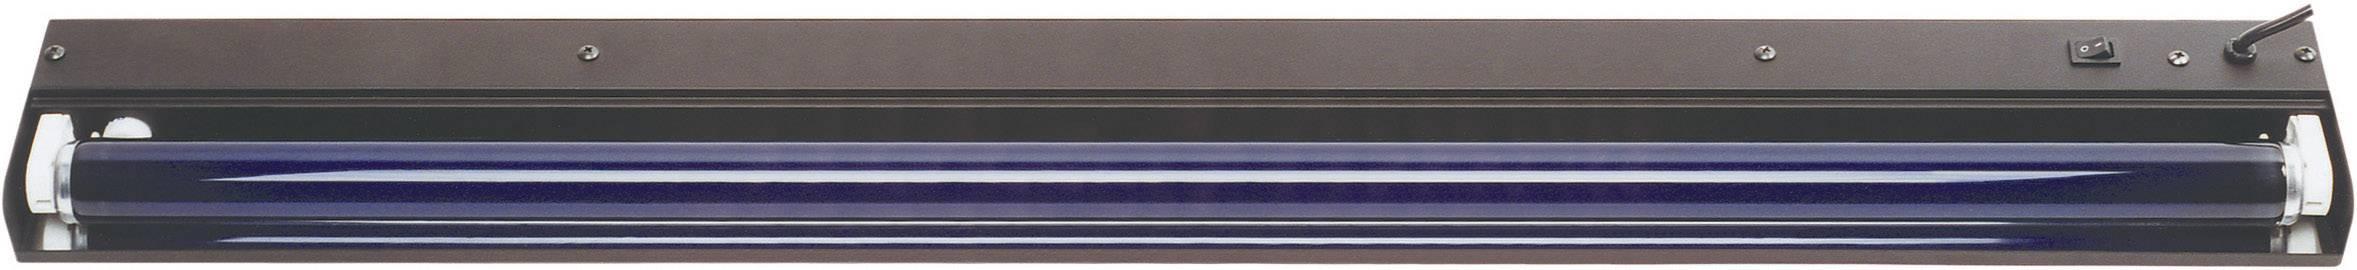 UV žiarivka s kovovým telesom, 120 cm, 36 W